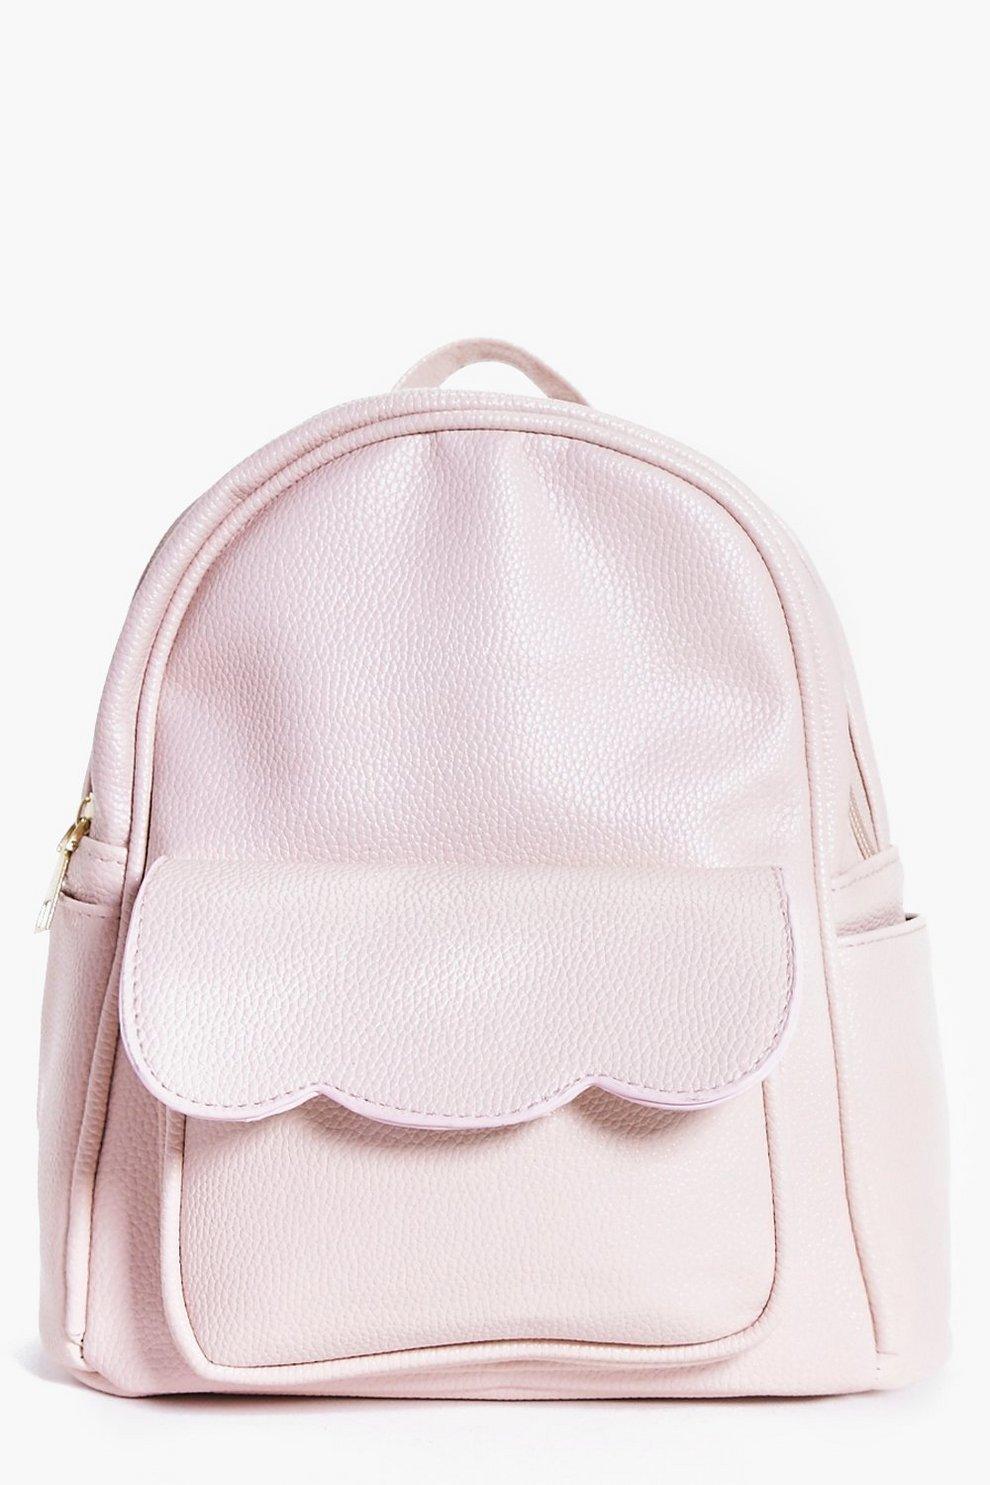 d3315baf21 jennifer sac à dos à poche festonnée | Boohoo